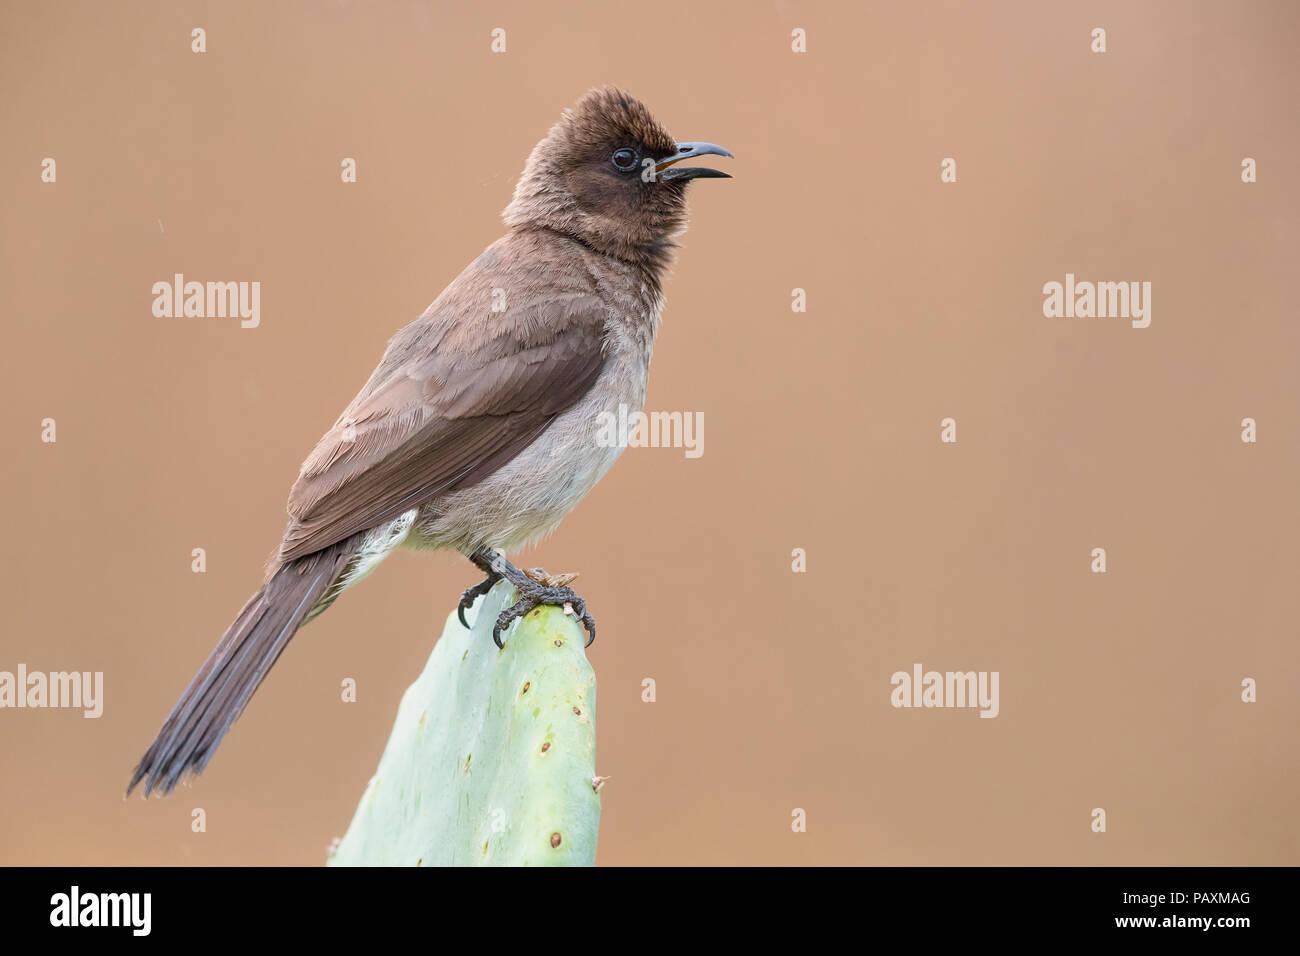 Gemeinsame bulbul (Pycnonotus Barbatus), Erwachsene singen Von einem barbary Abb. Stockbild